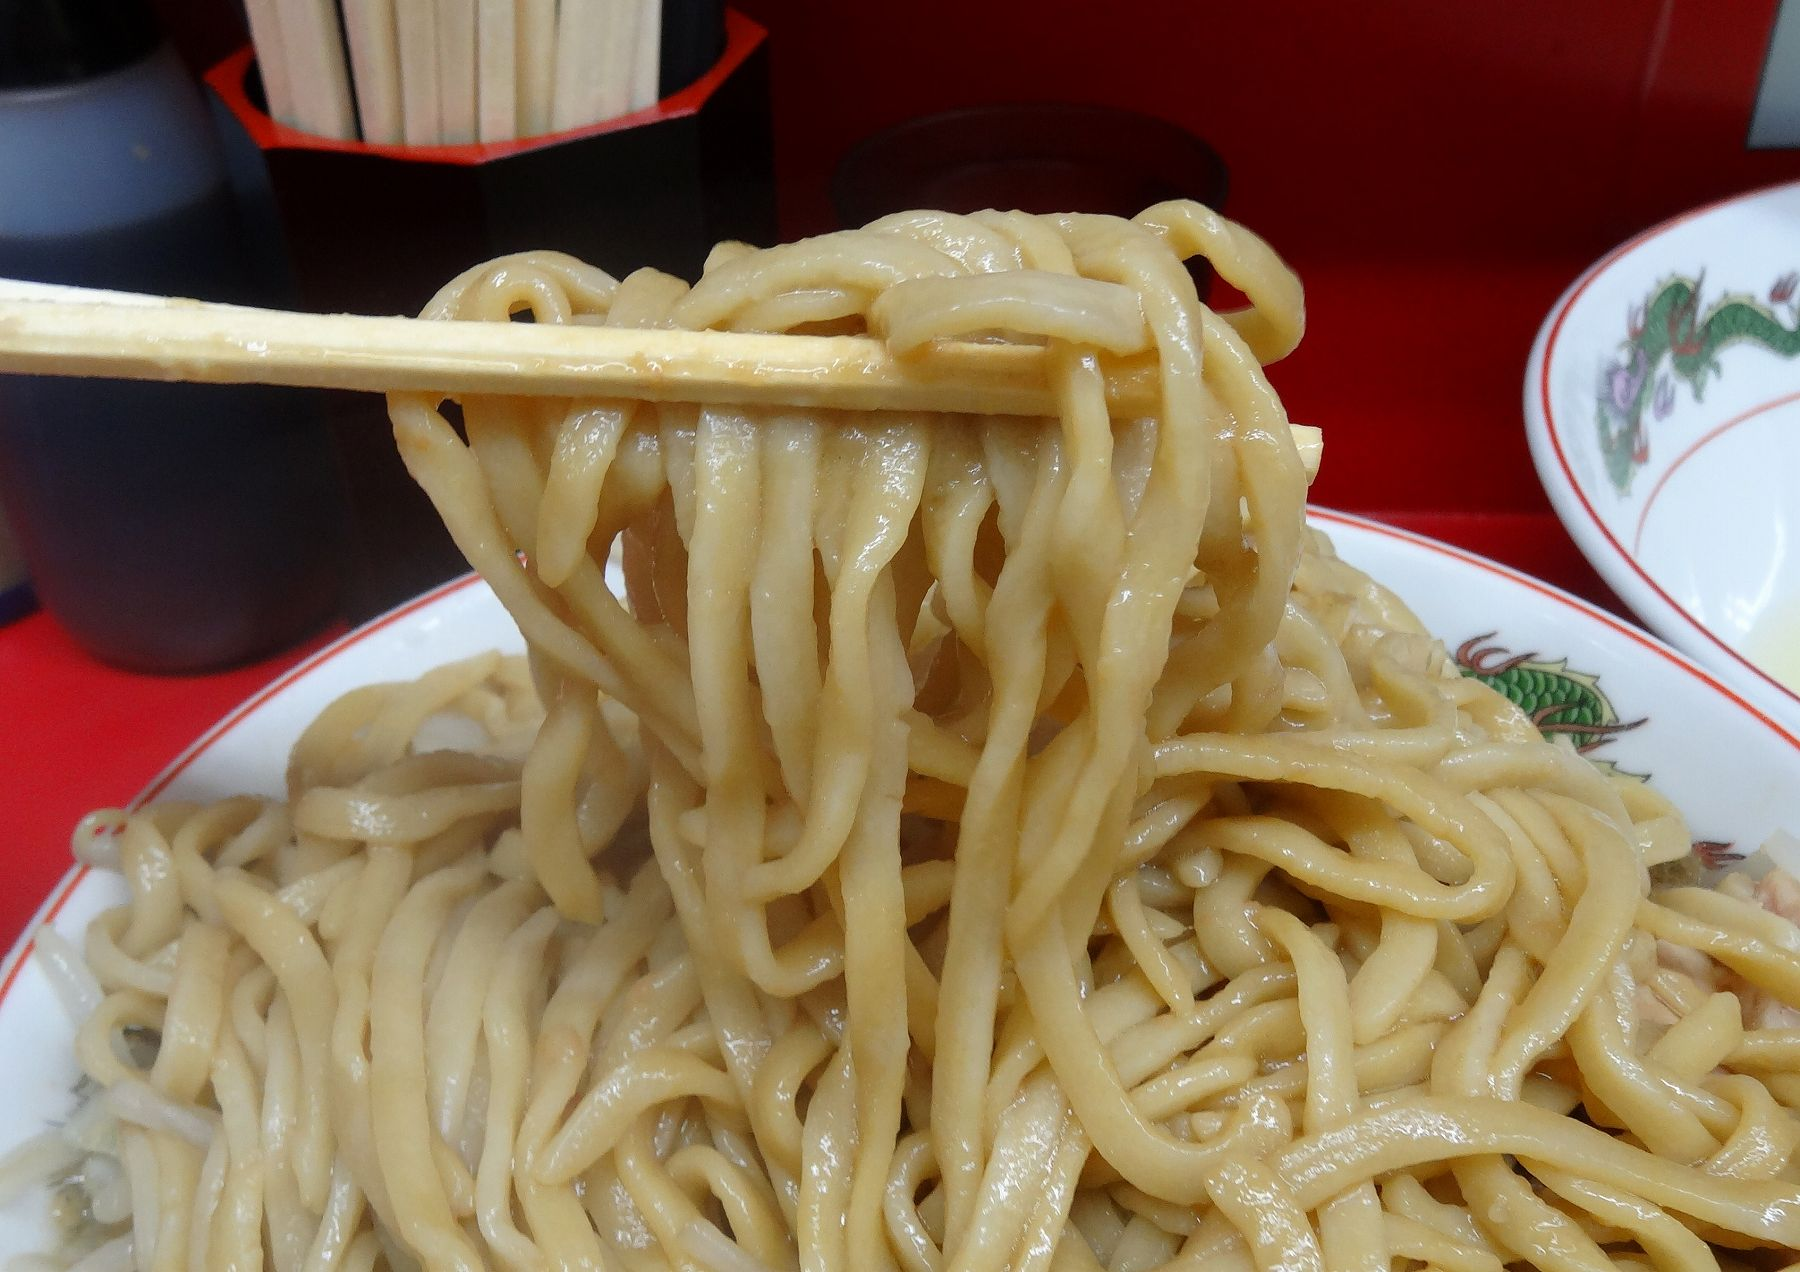 20121028005fujisawa.jpg